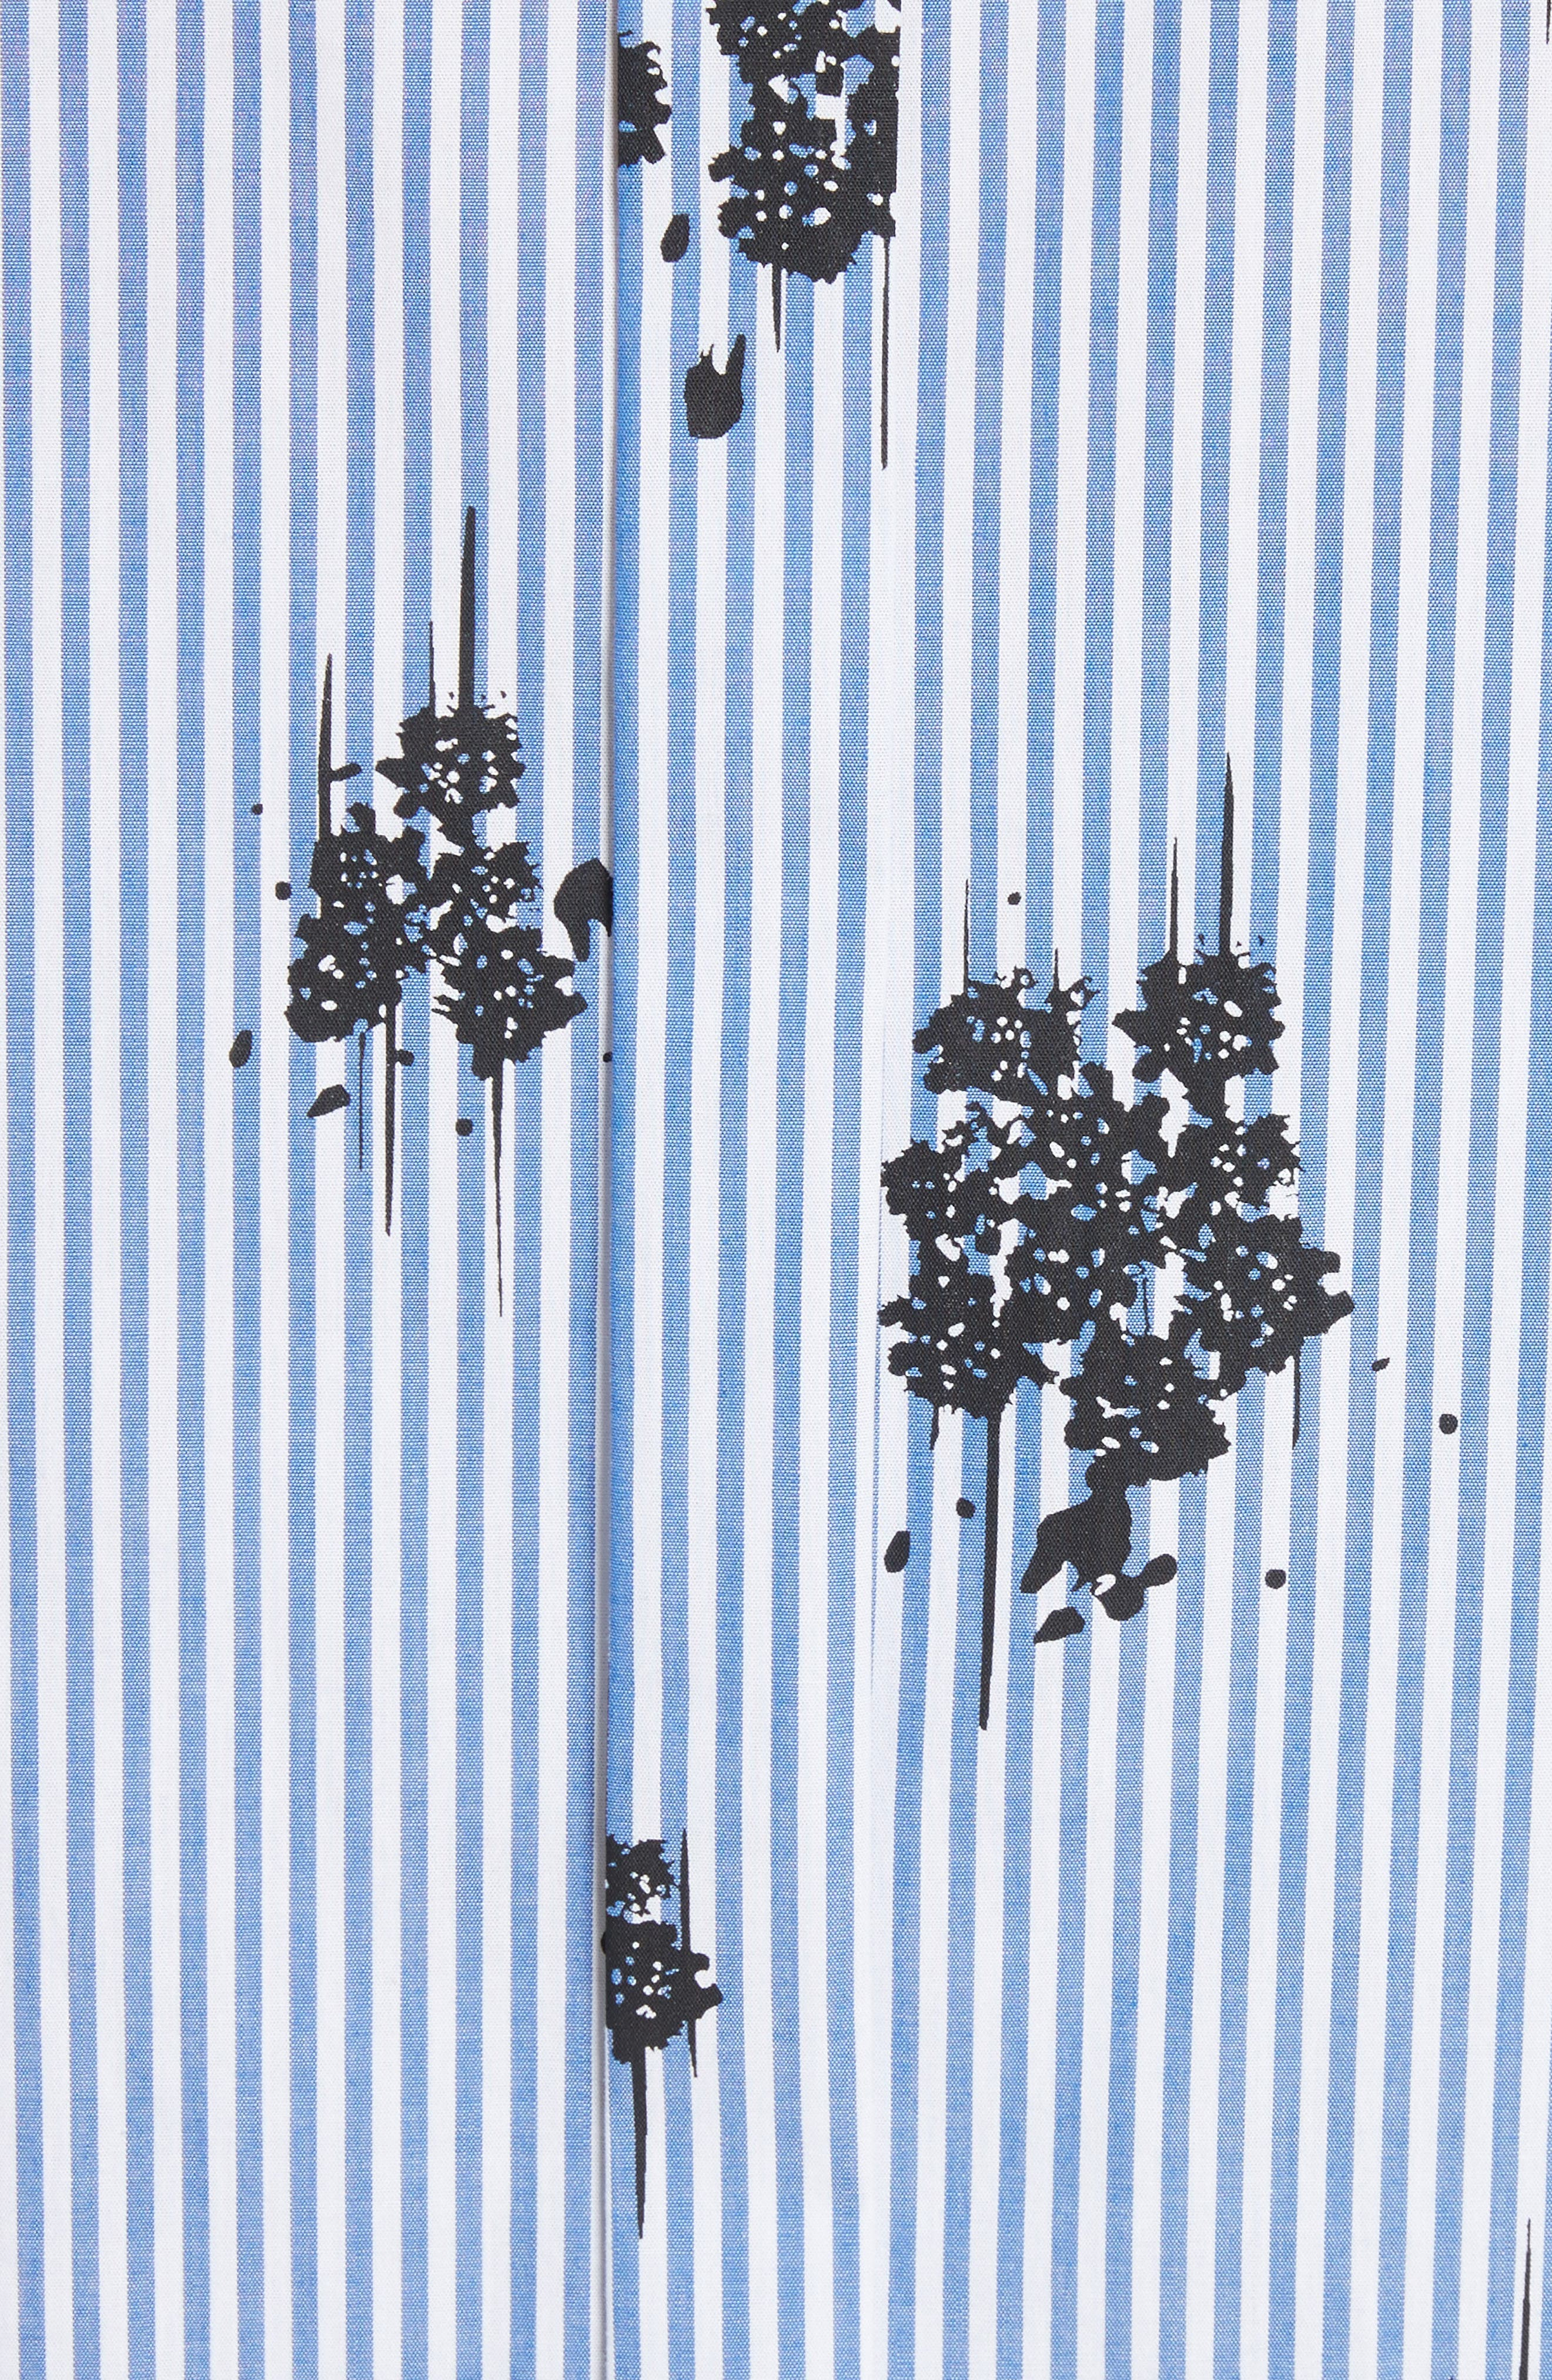 2-in-1 Ruffled Shirtdress,                             Alternate thumbnail 6, color,                             420